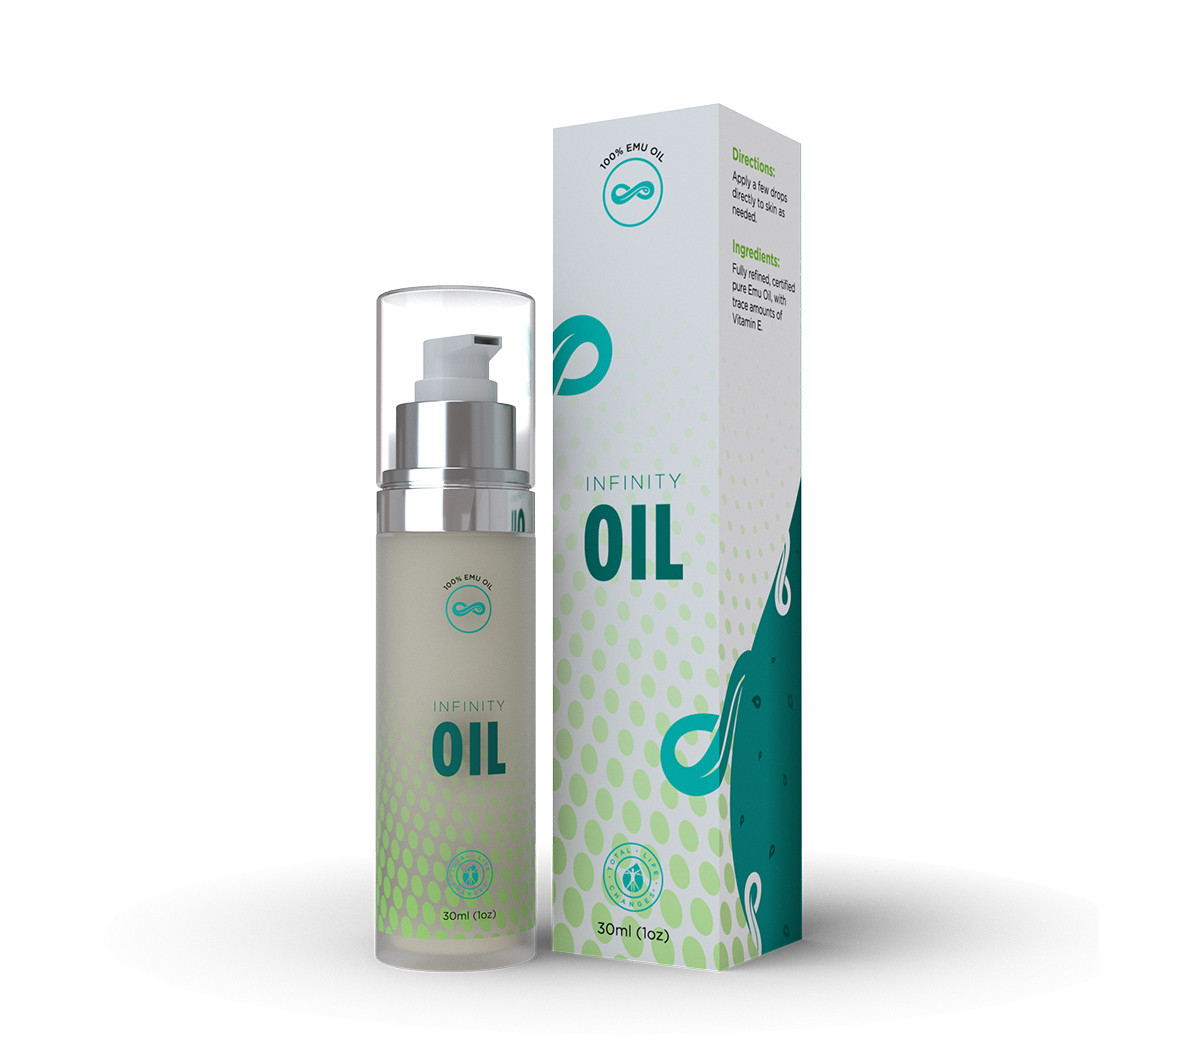 Infinity Emu Oil